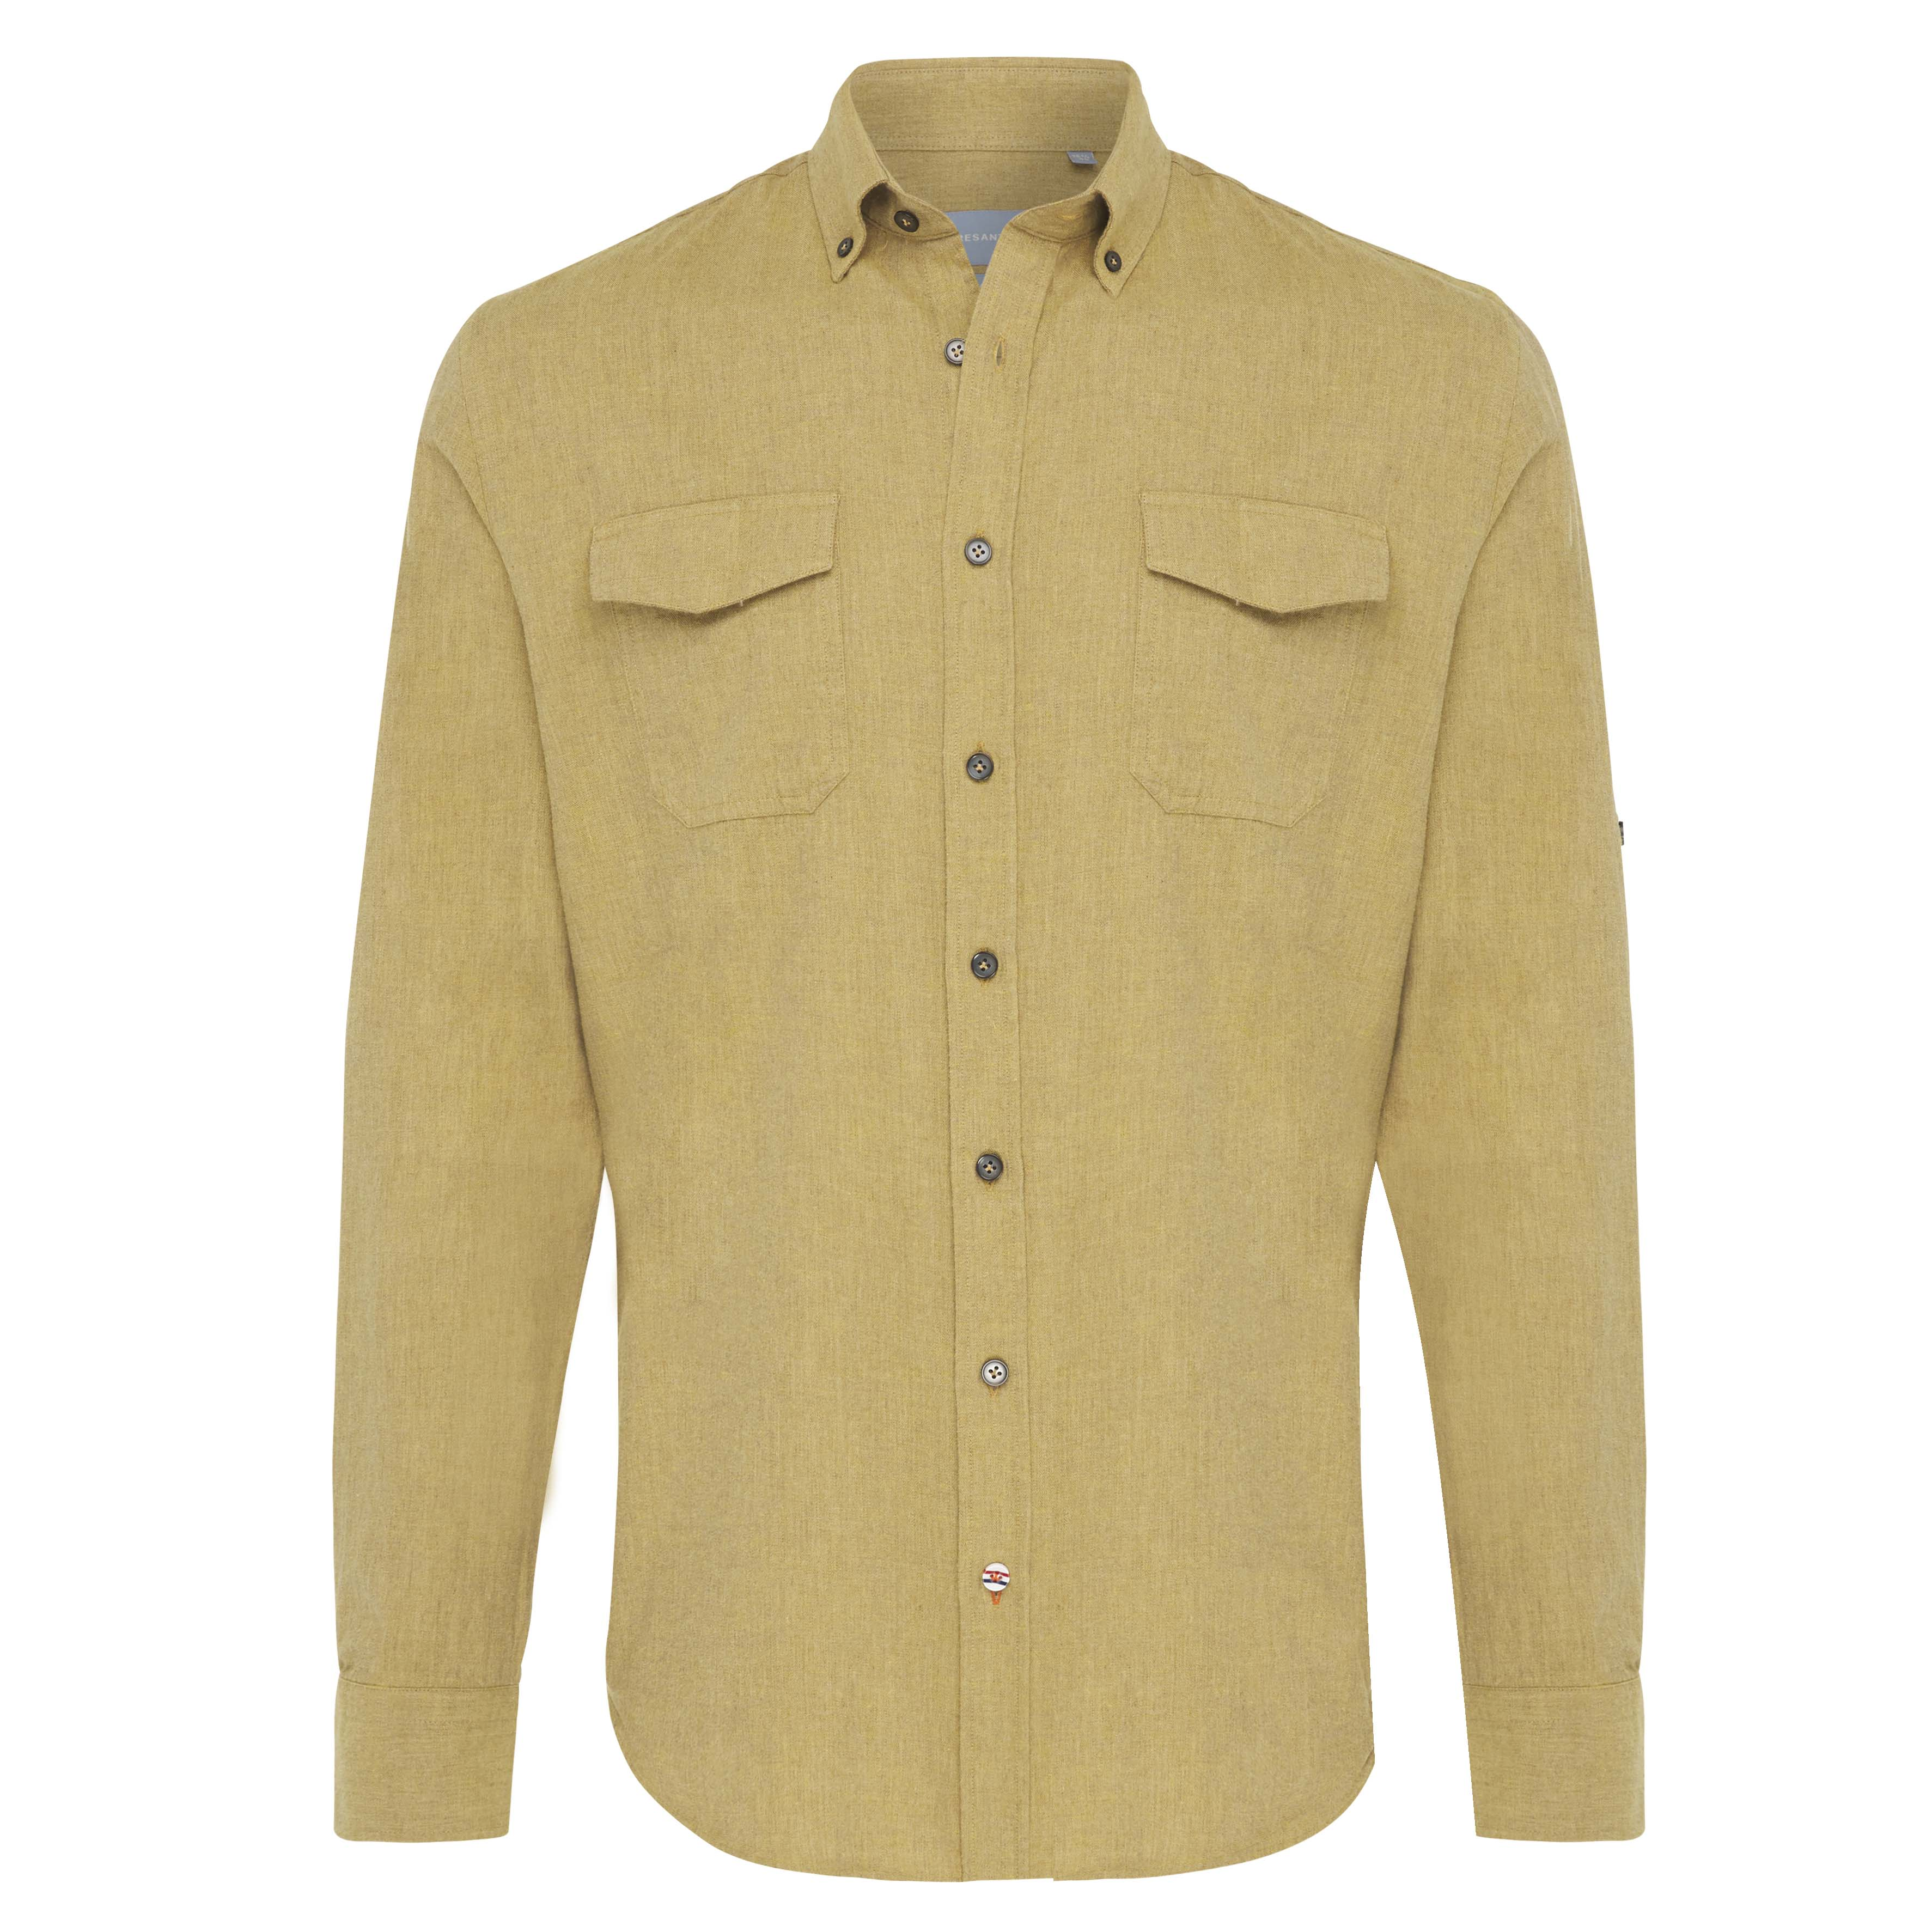 Jasper   Shirt plain flannel